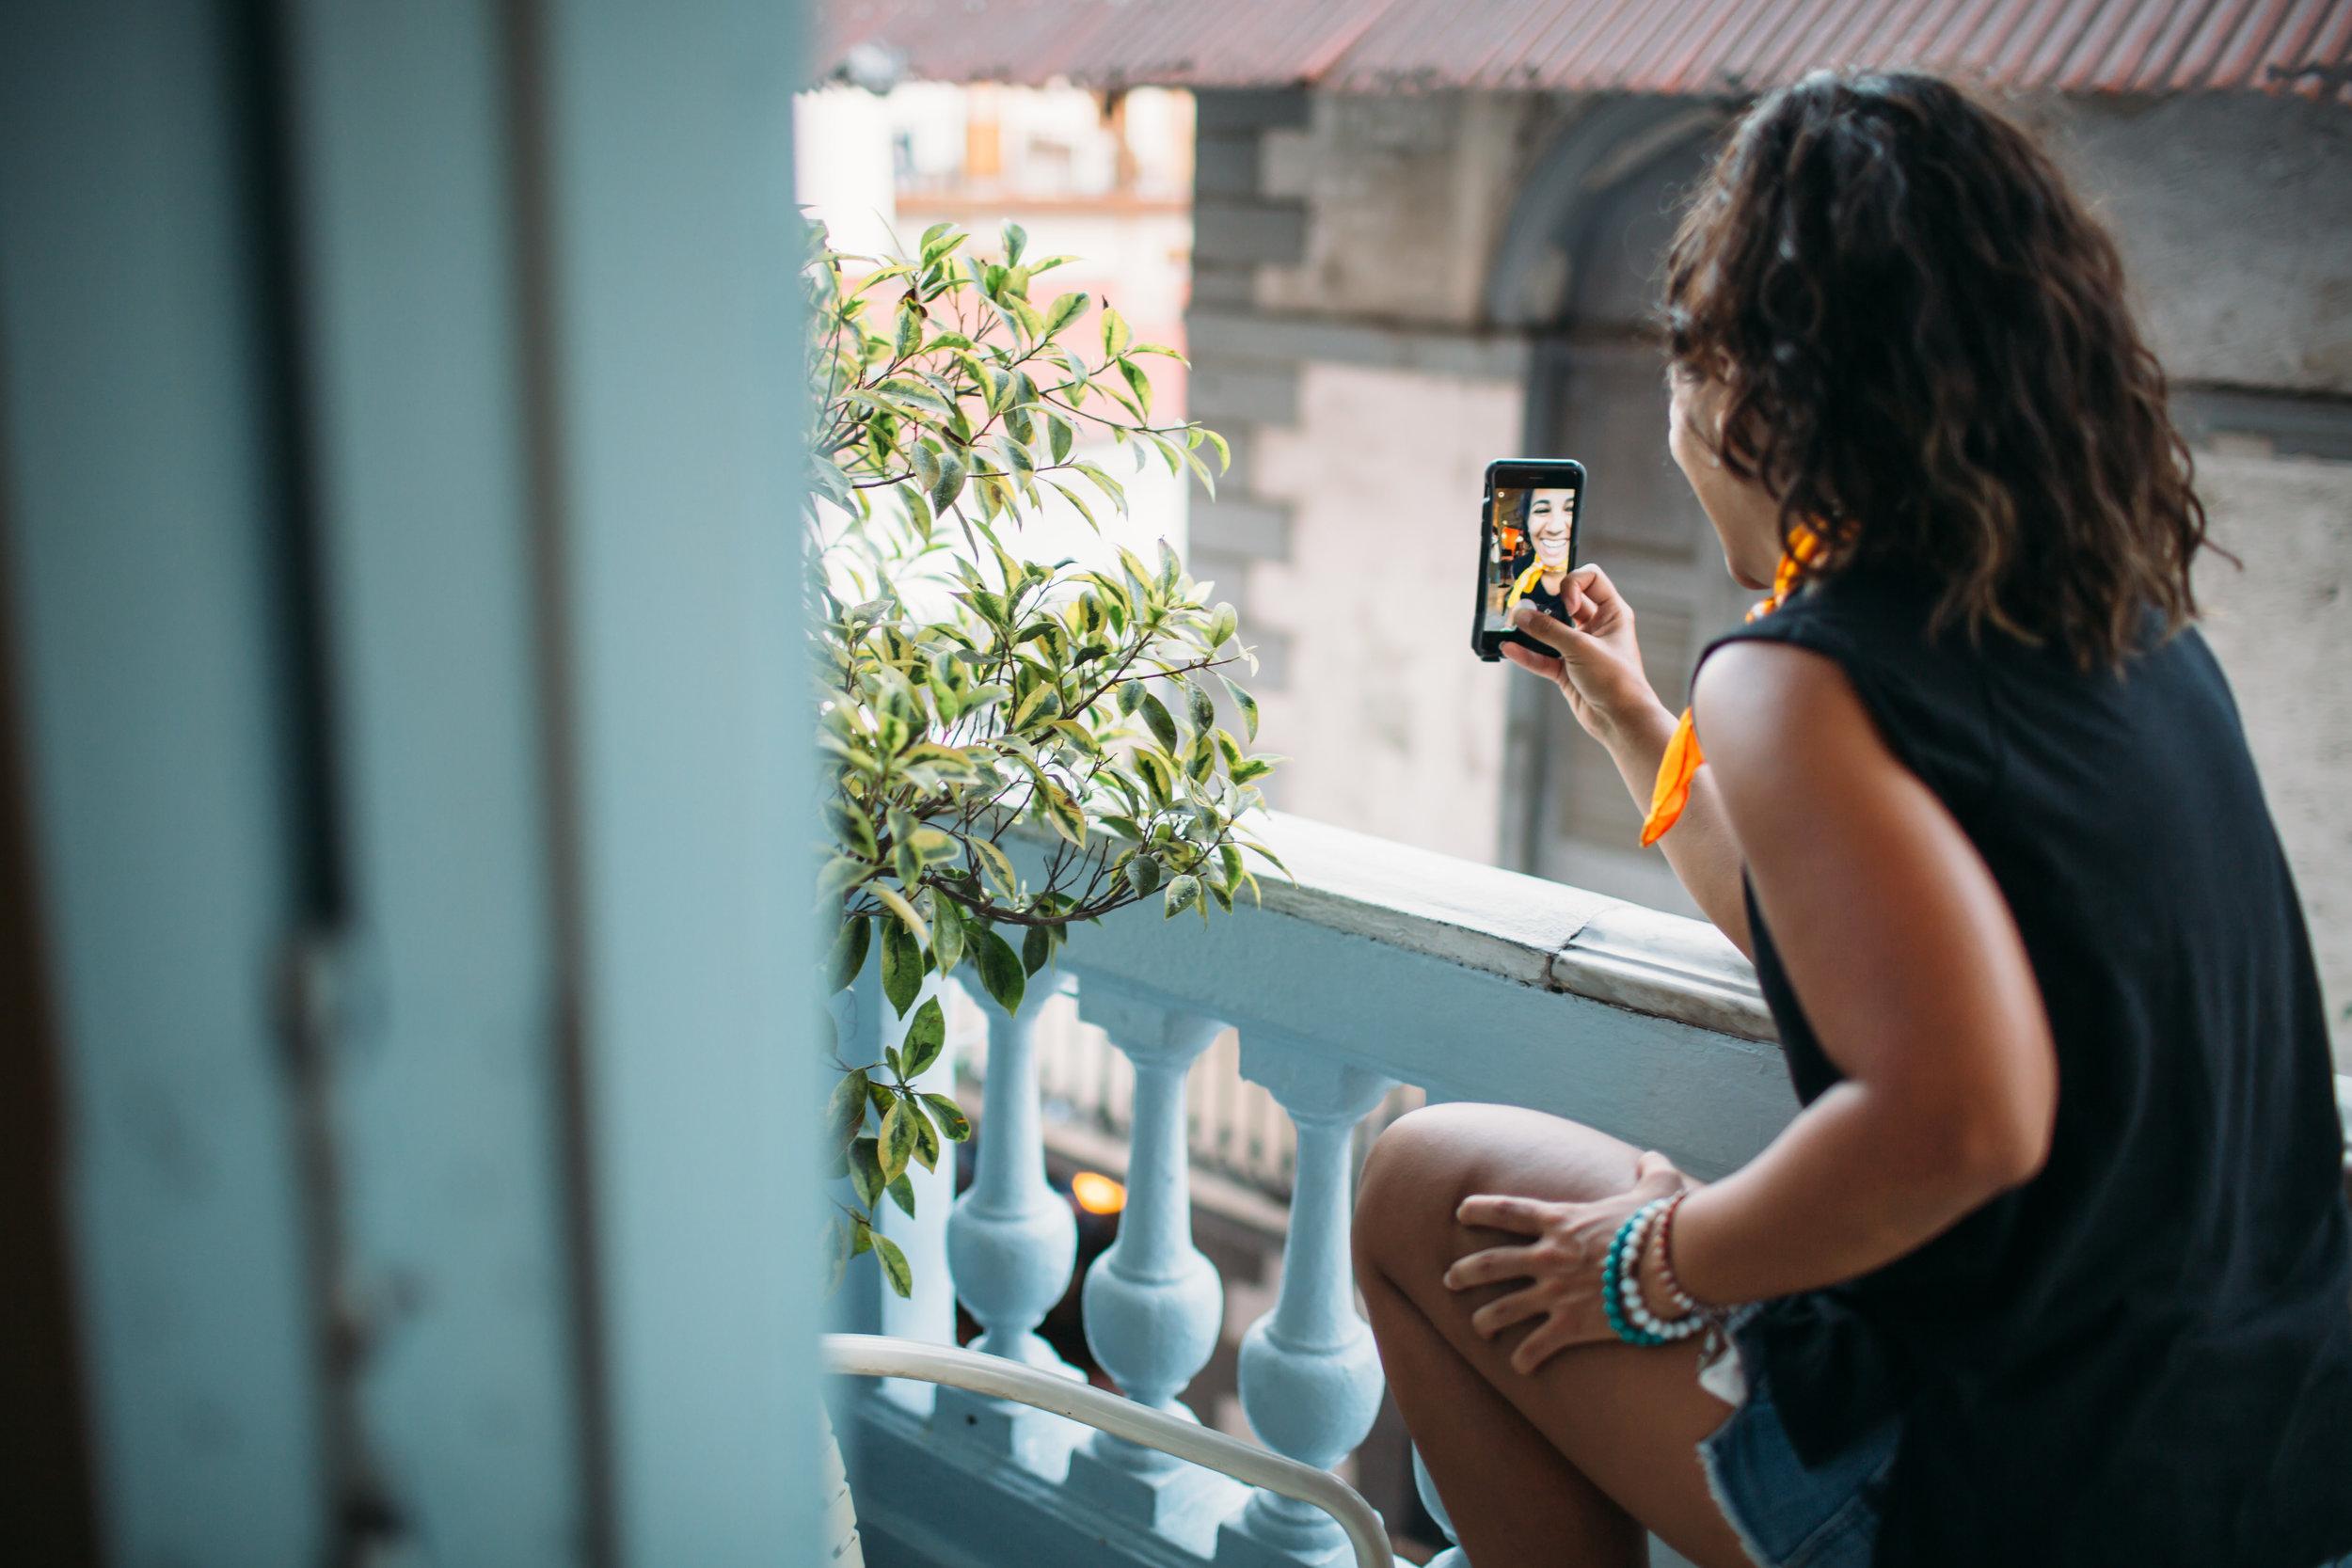 andrea valeria, it's a travel o.d., itsatravelod, vlogger, so you want to vlog